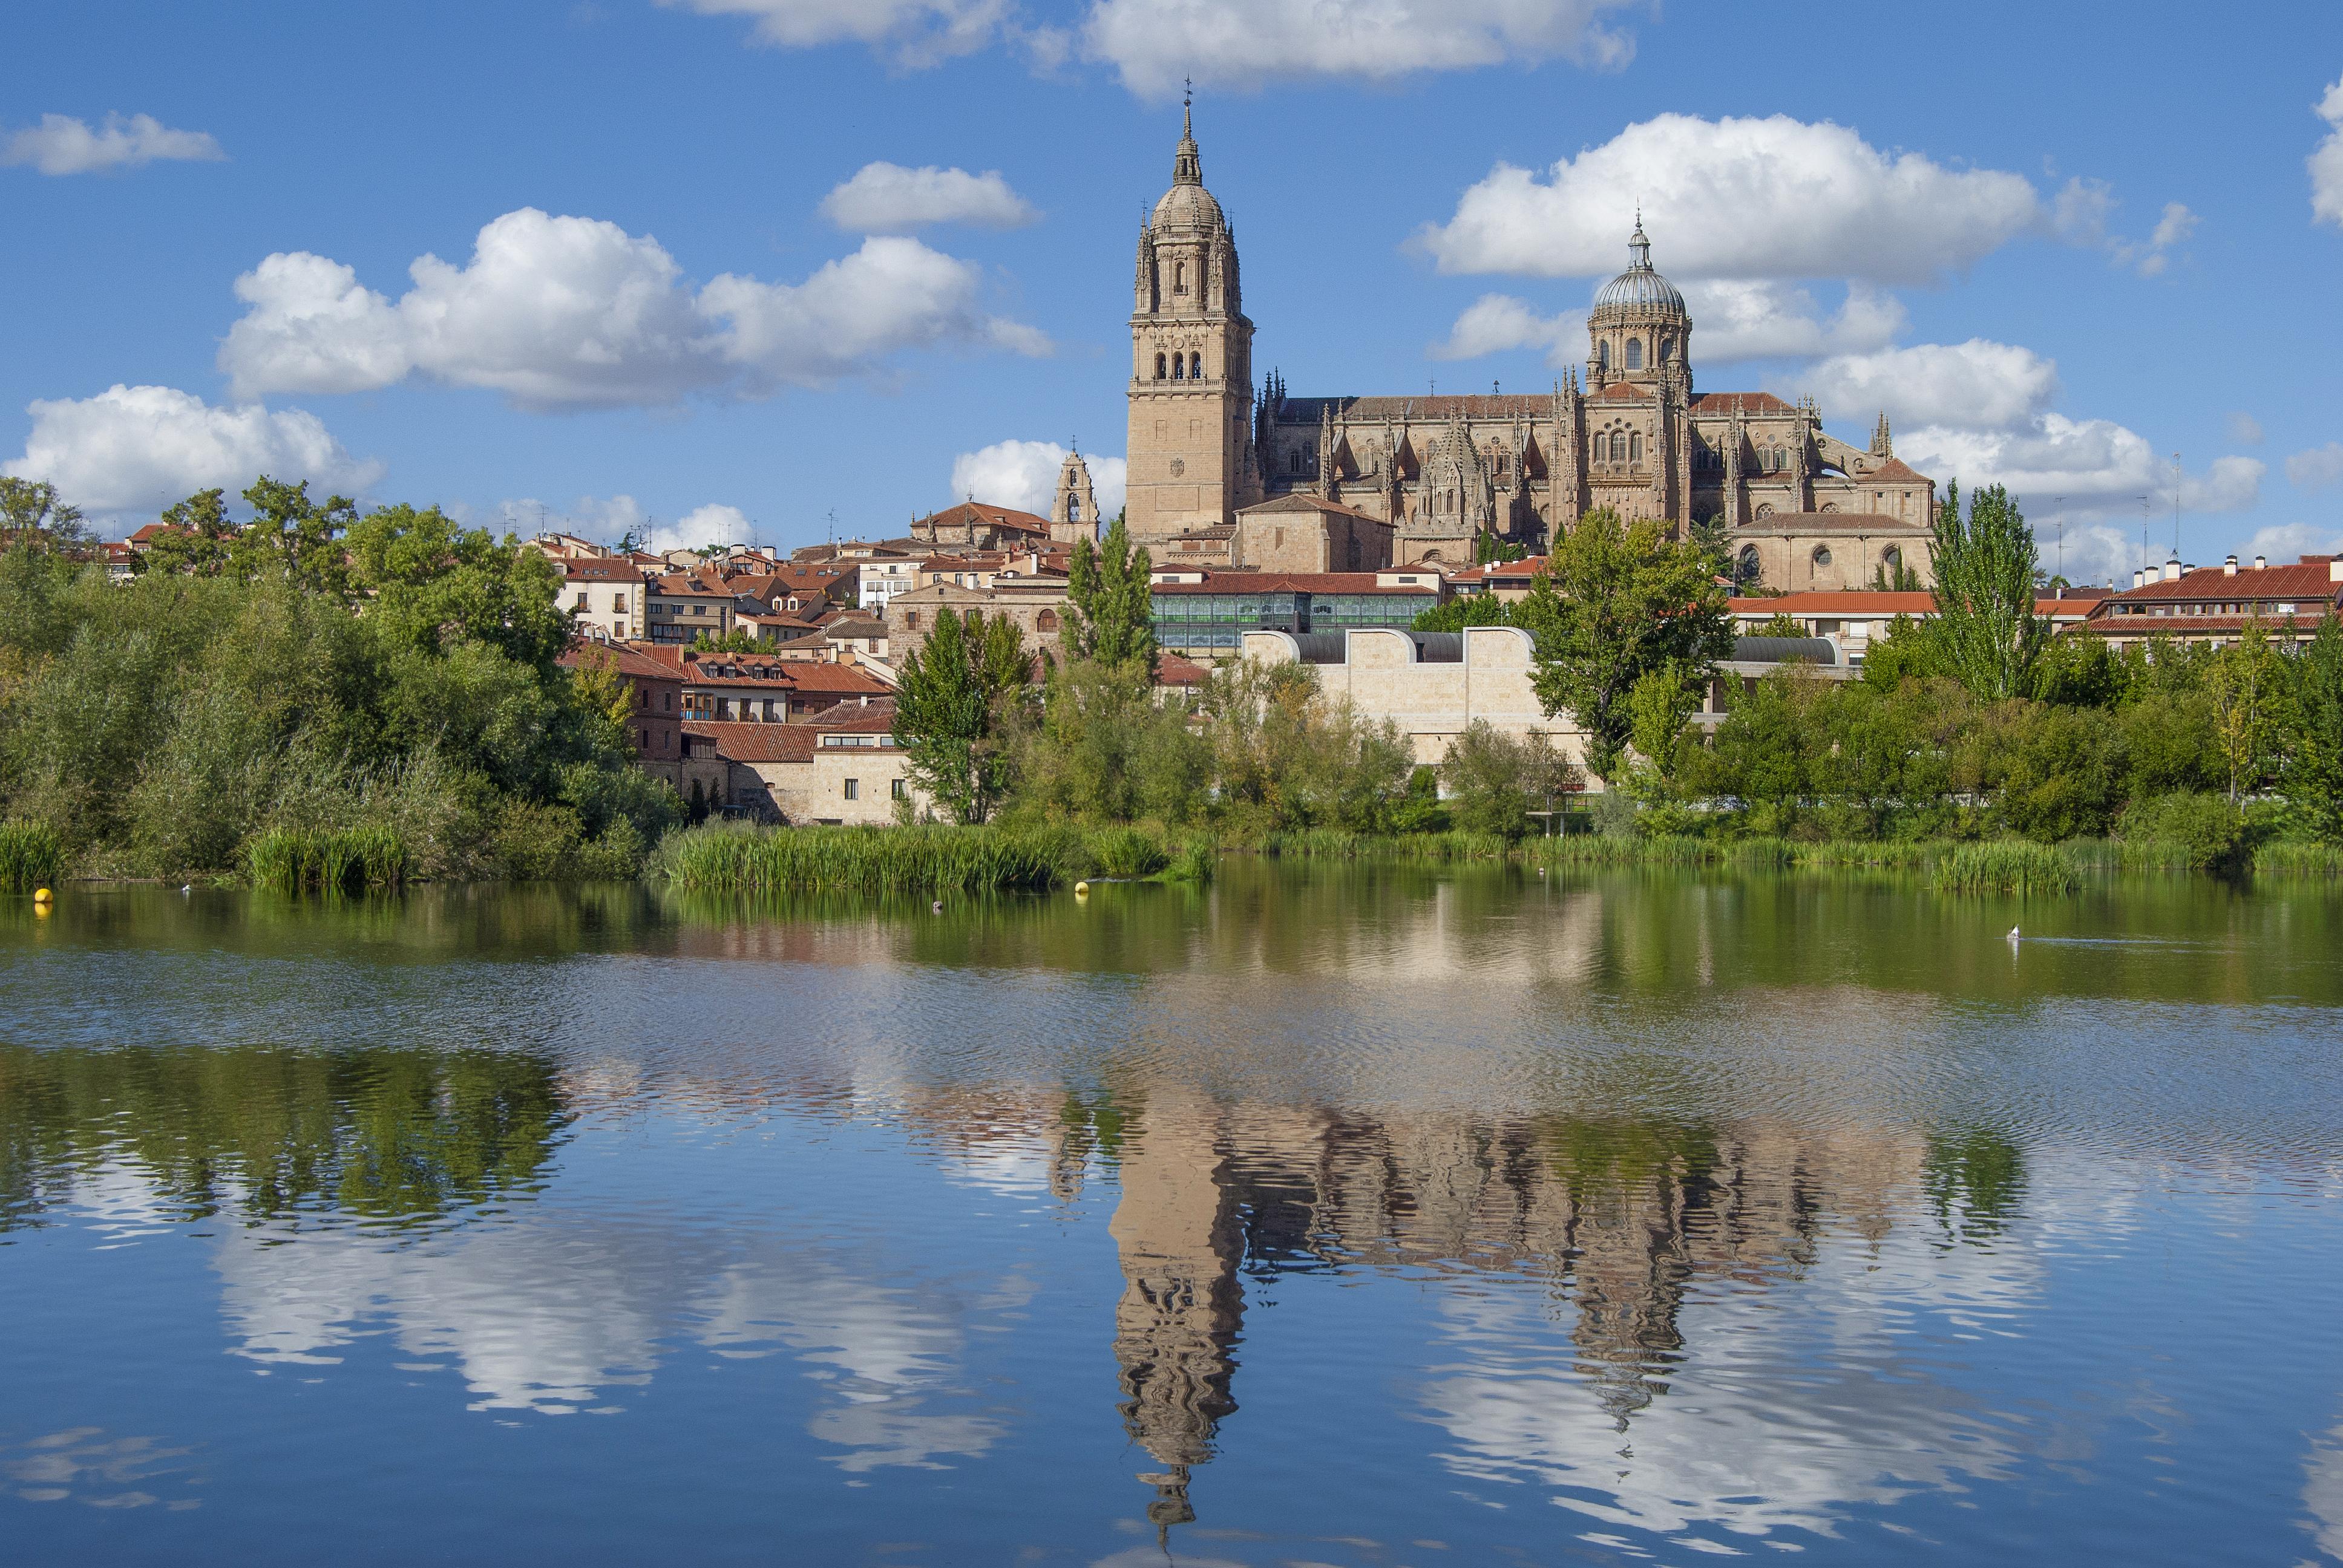 Fichier:Reflejos de la Catedrales de Salamanca.jpg — Wikipédia